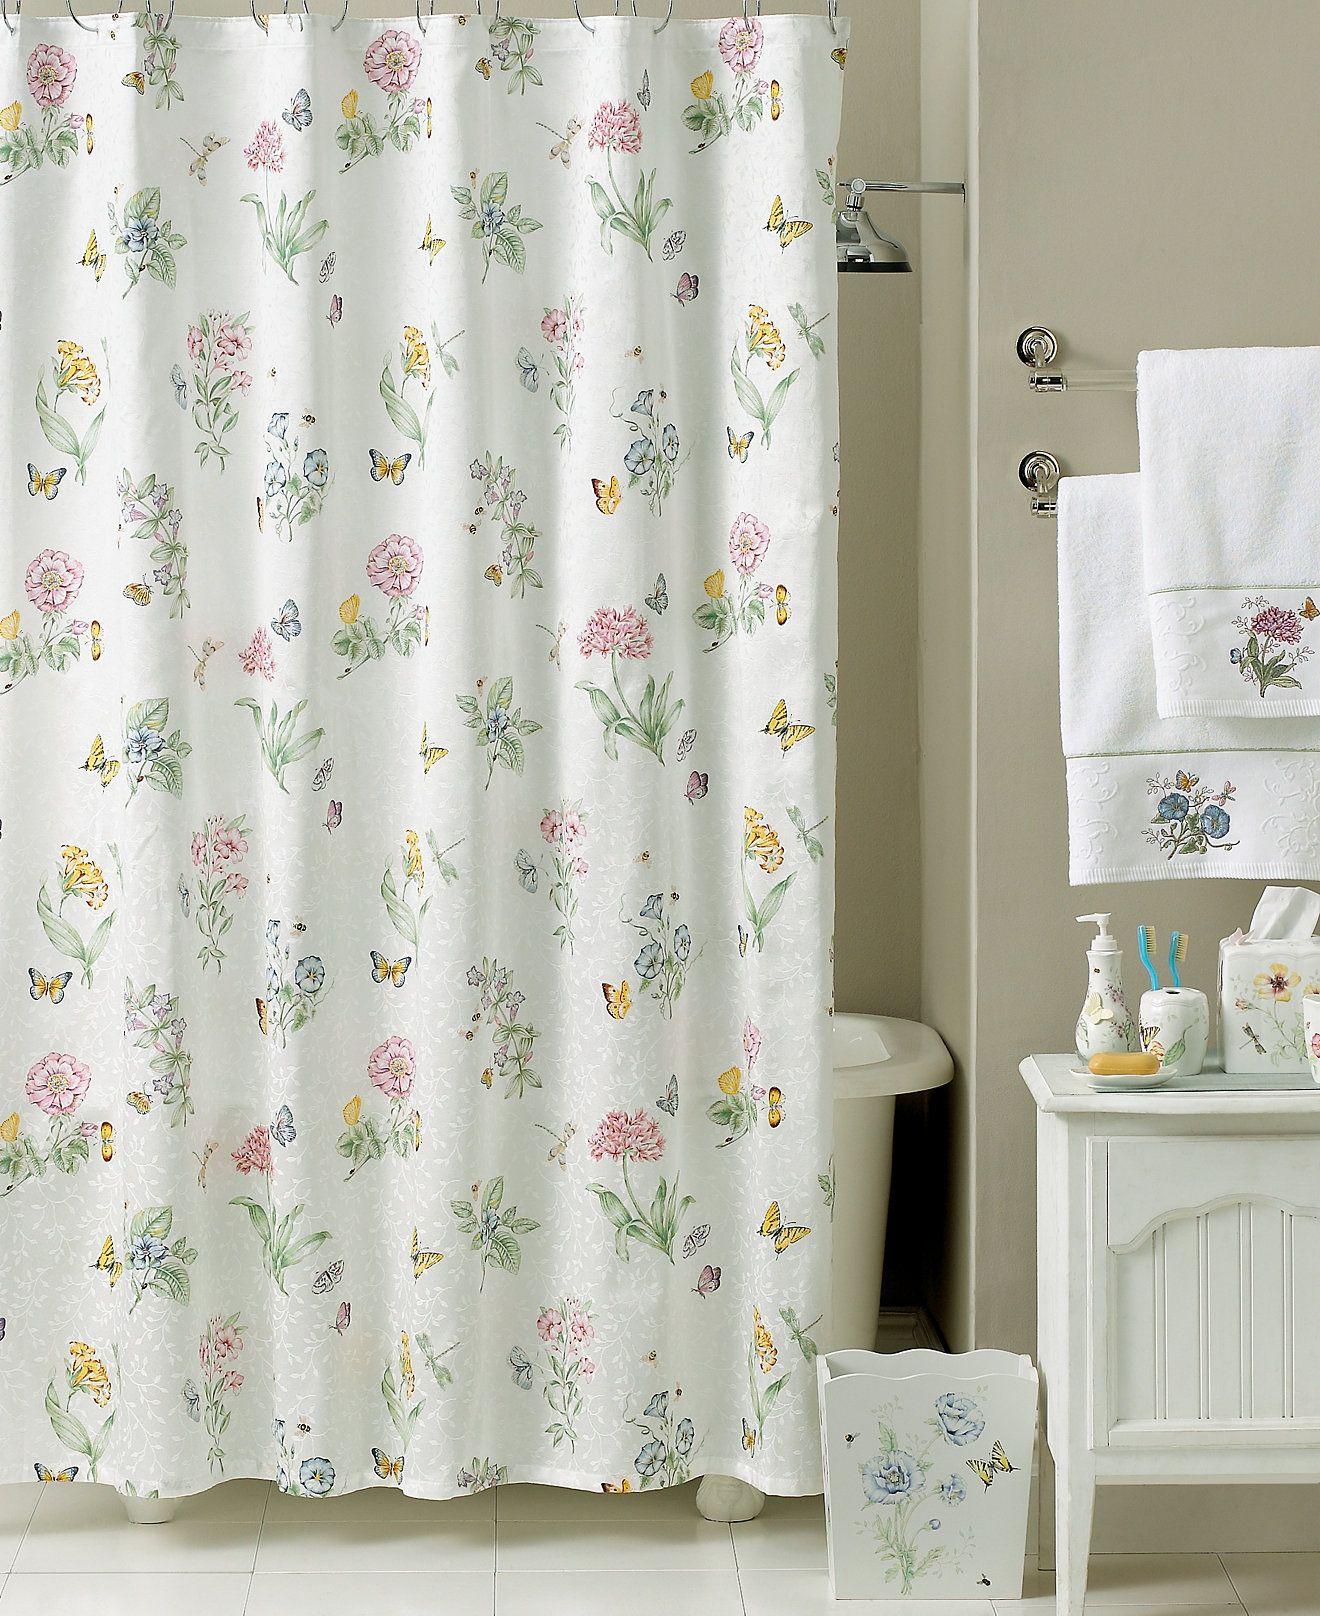 Lenox Bath Accessories, Butterfly Meadow Shower Curtain | Bath ...